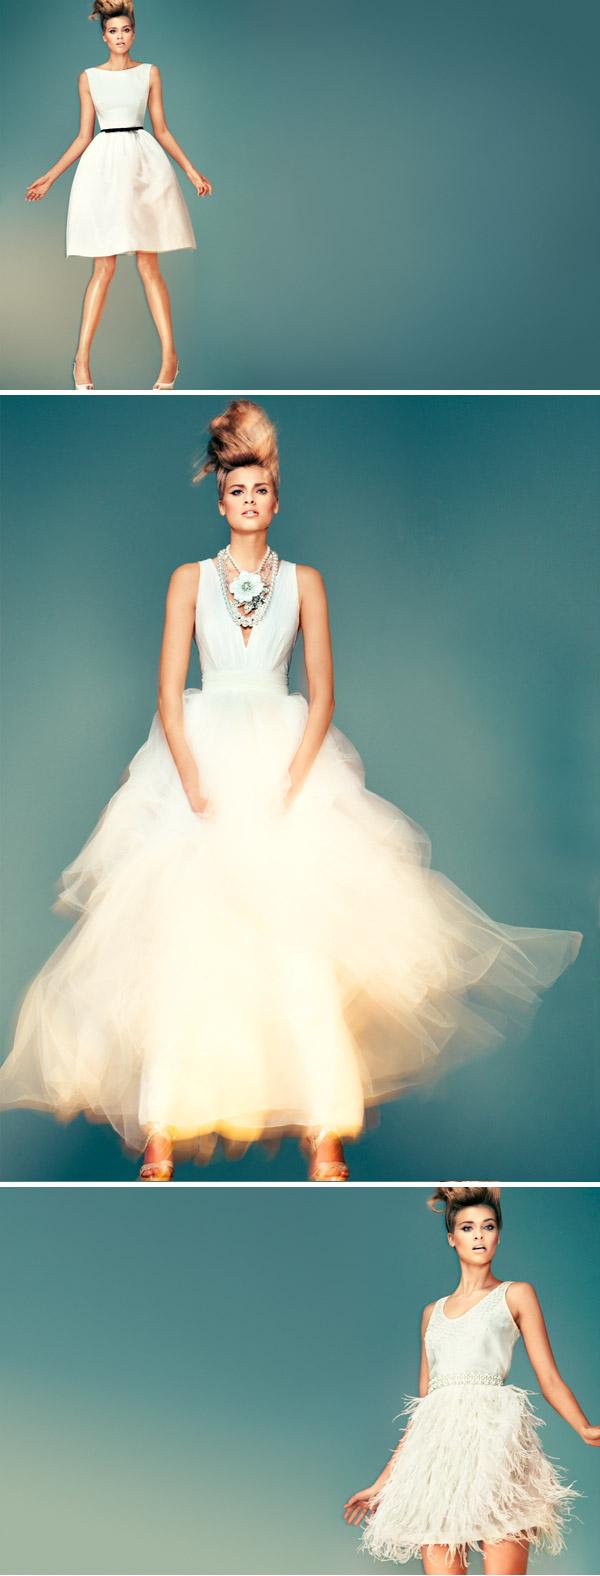 Net-a-Porter Archives - ROCK MY WEDDING | UK WEDDING BLOG & DIRECTORY